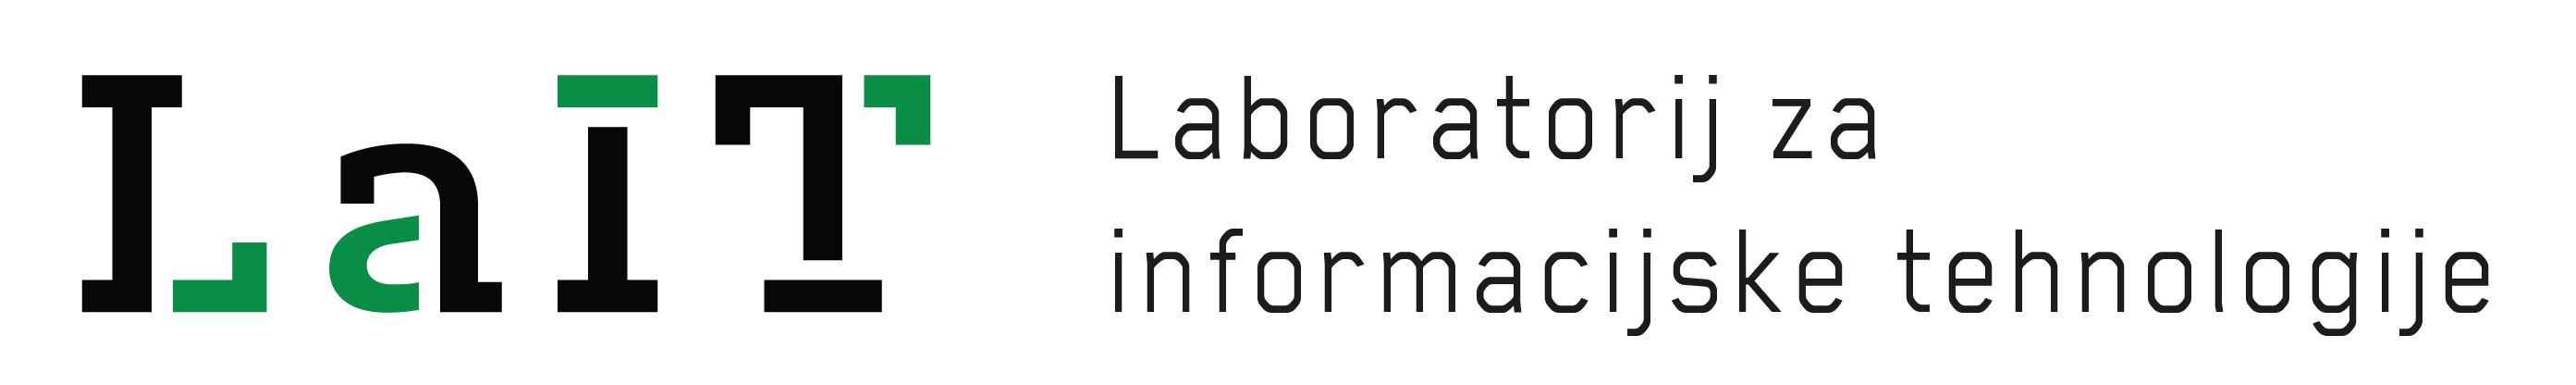 Laboratorij za informacijske tehnologije